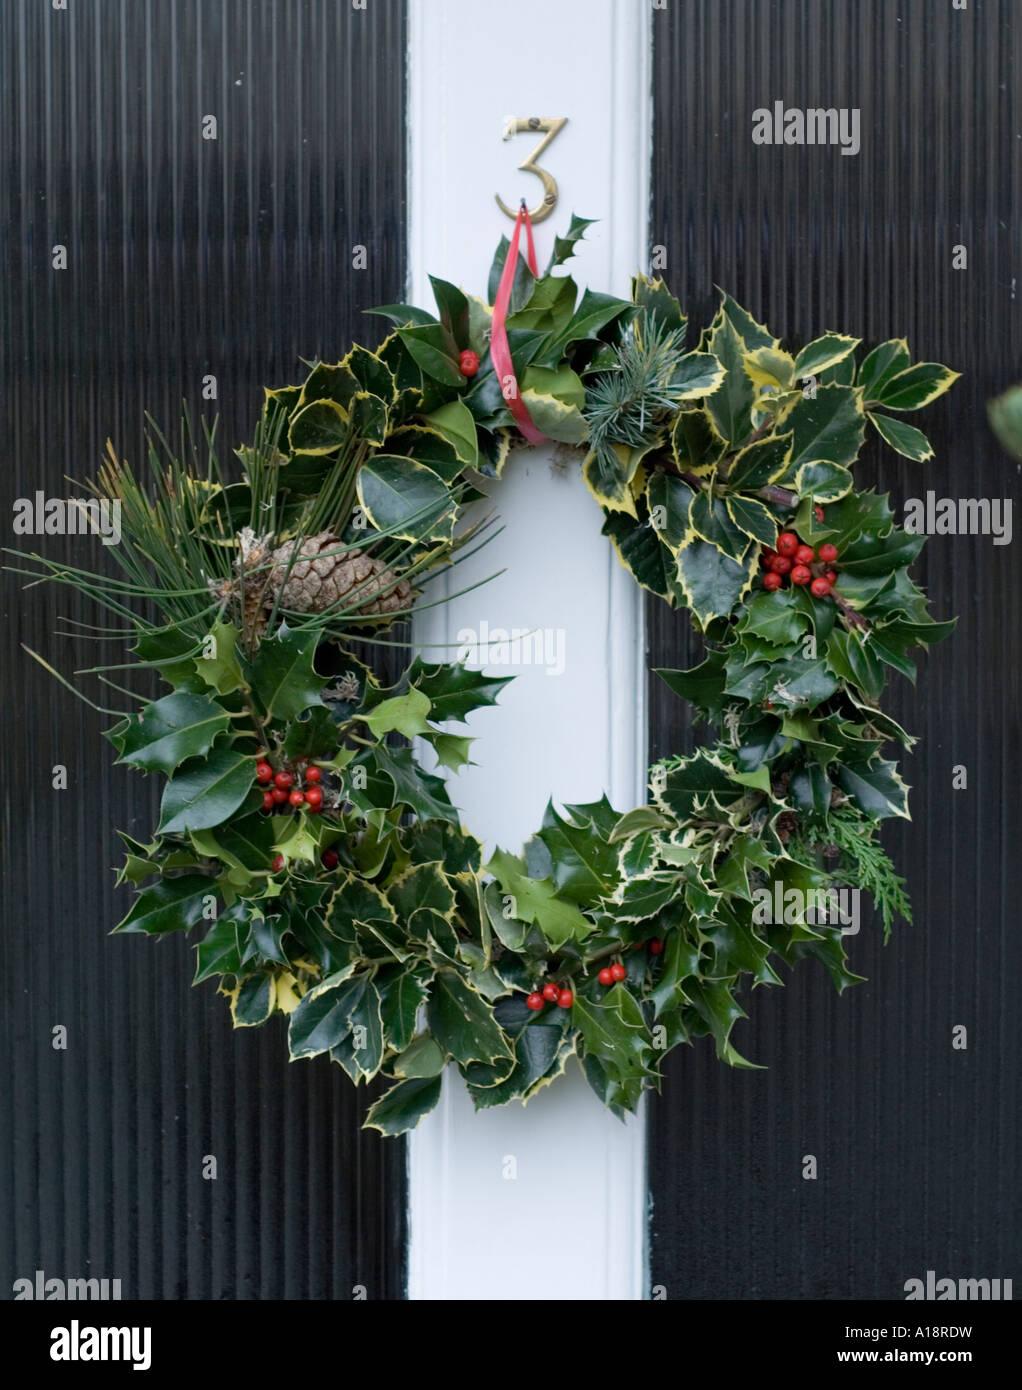 England Uk Christmas Wreath On A Front Door Stock Photo 10181076